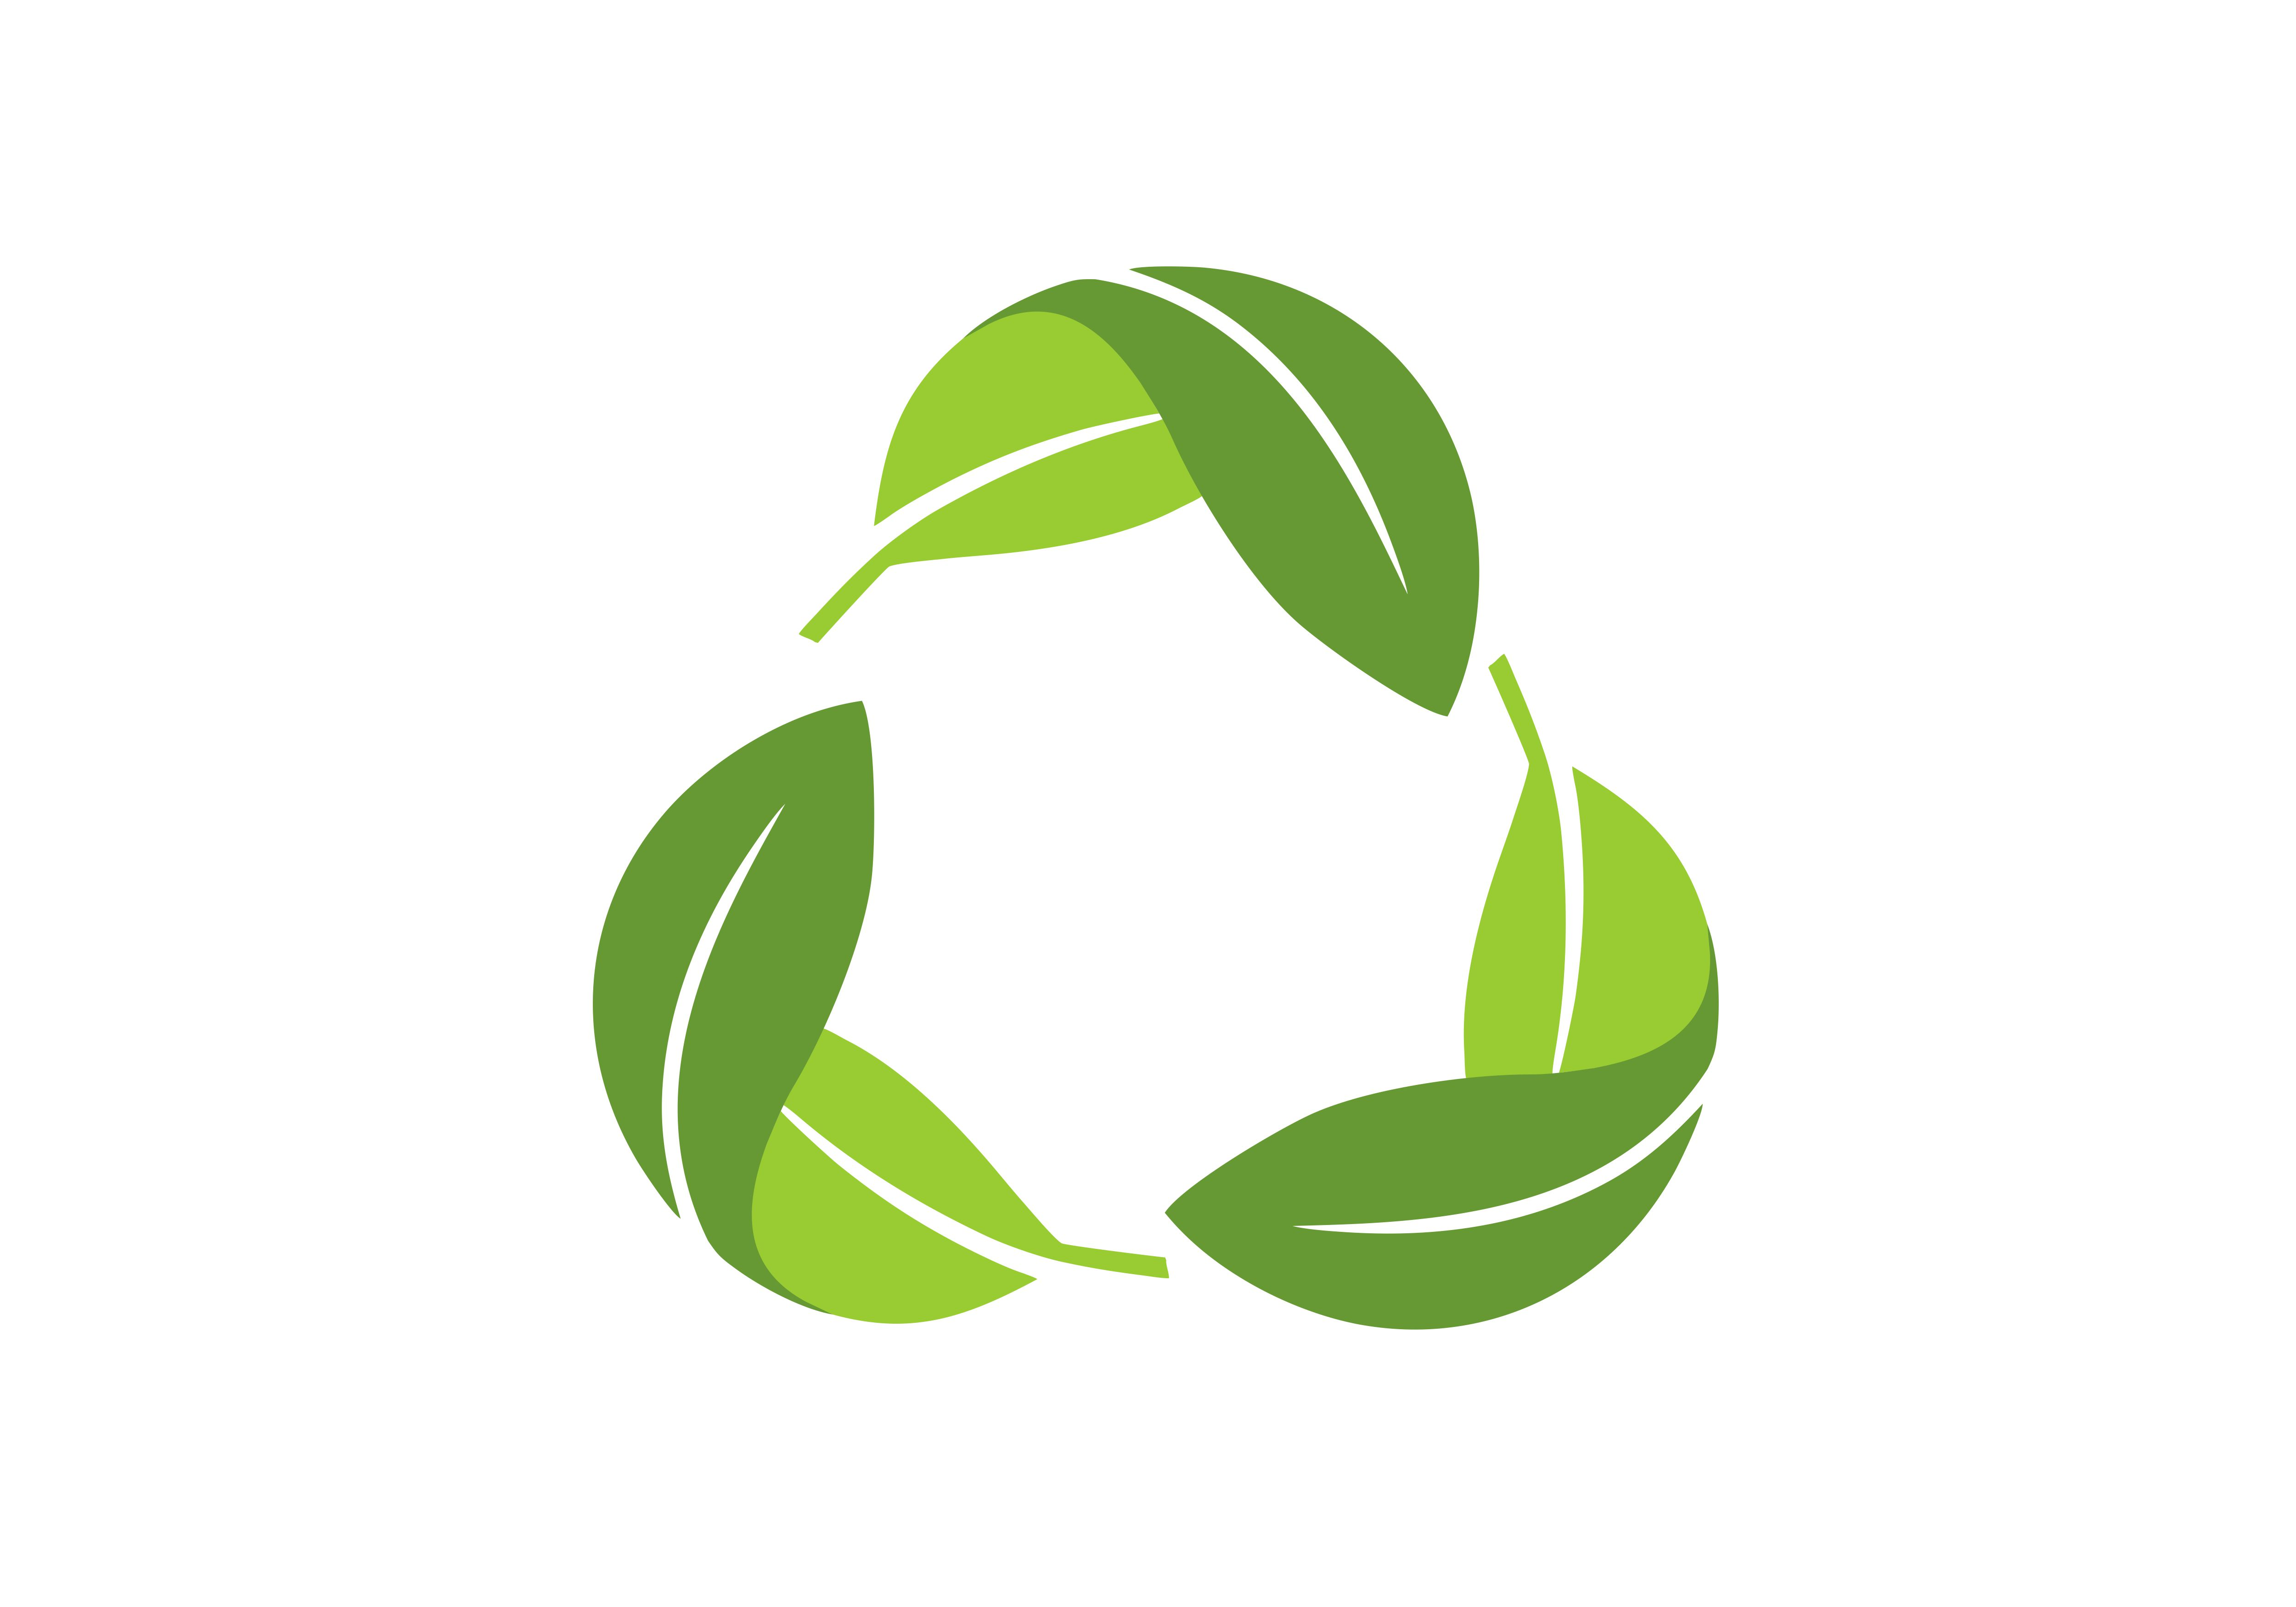 Go green, leaf, ecology logo.